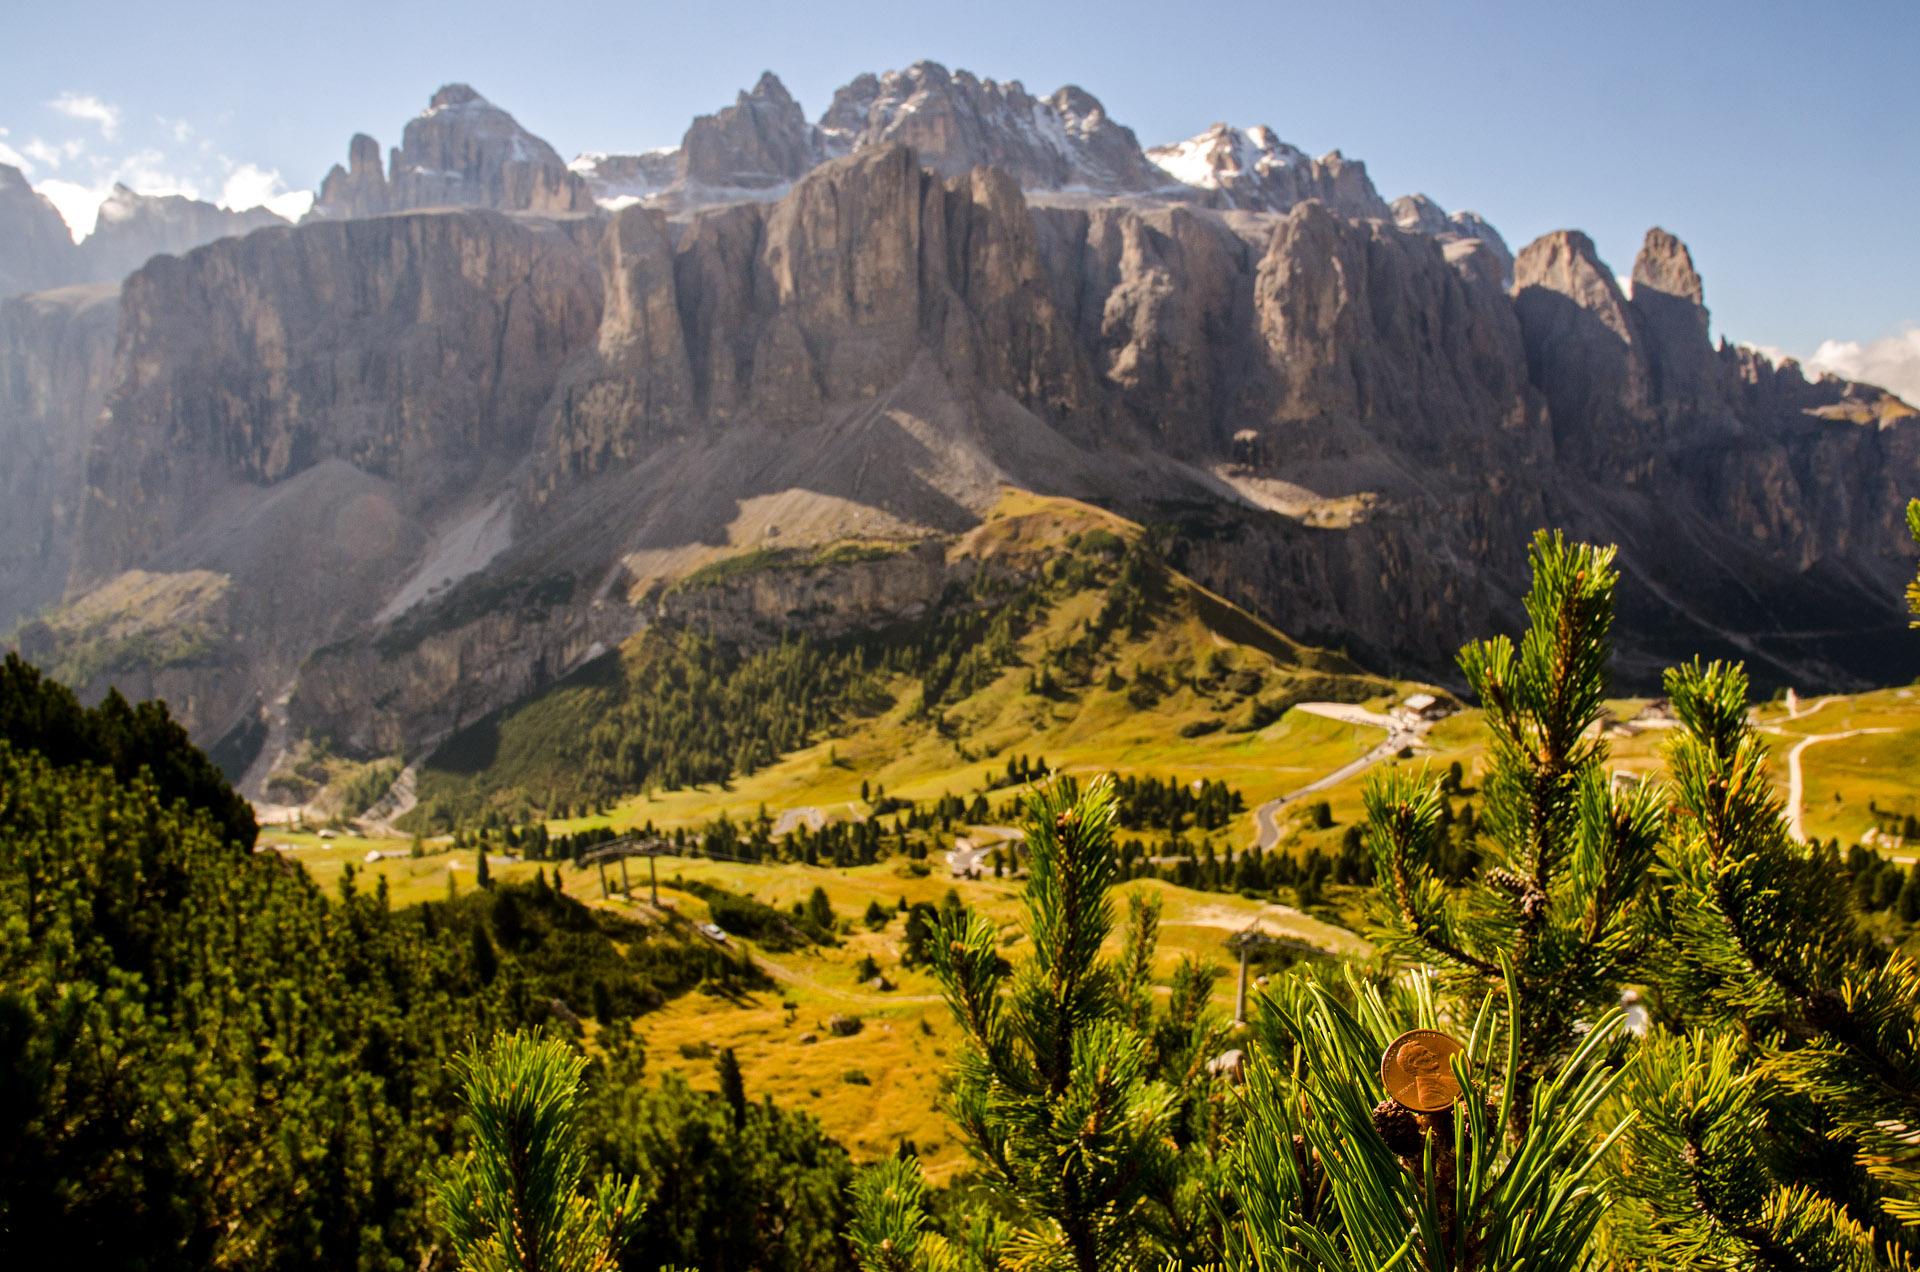 Sella Group (Dolomites)